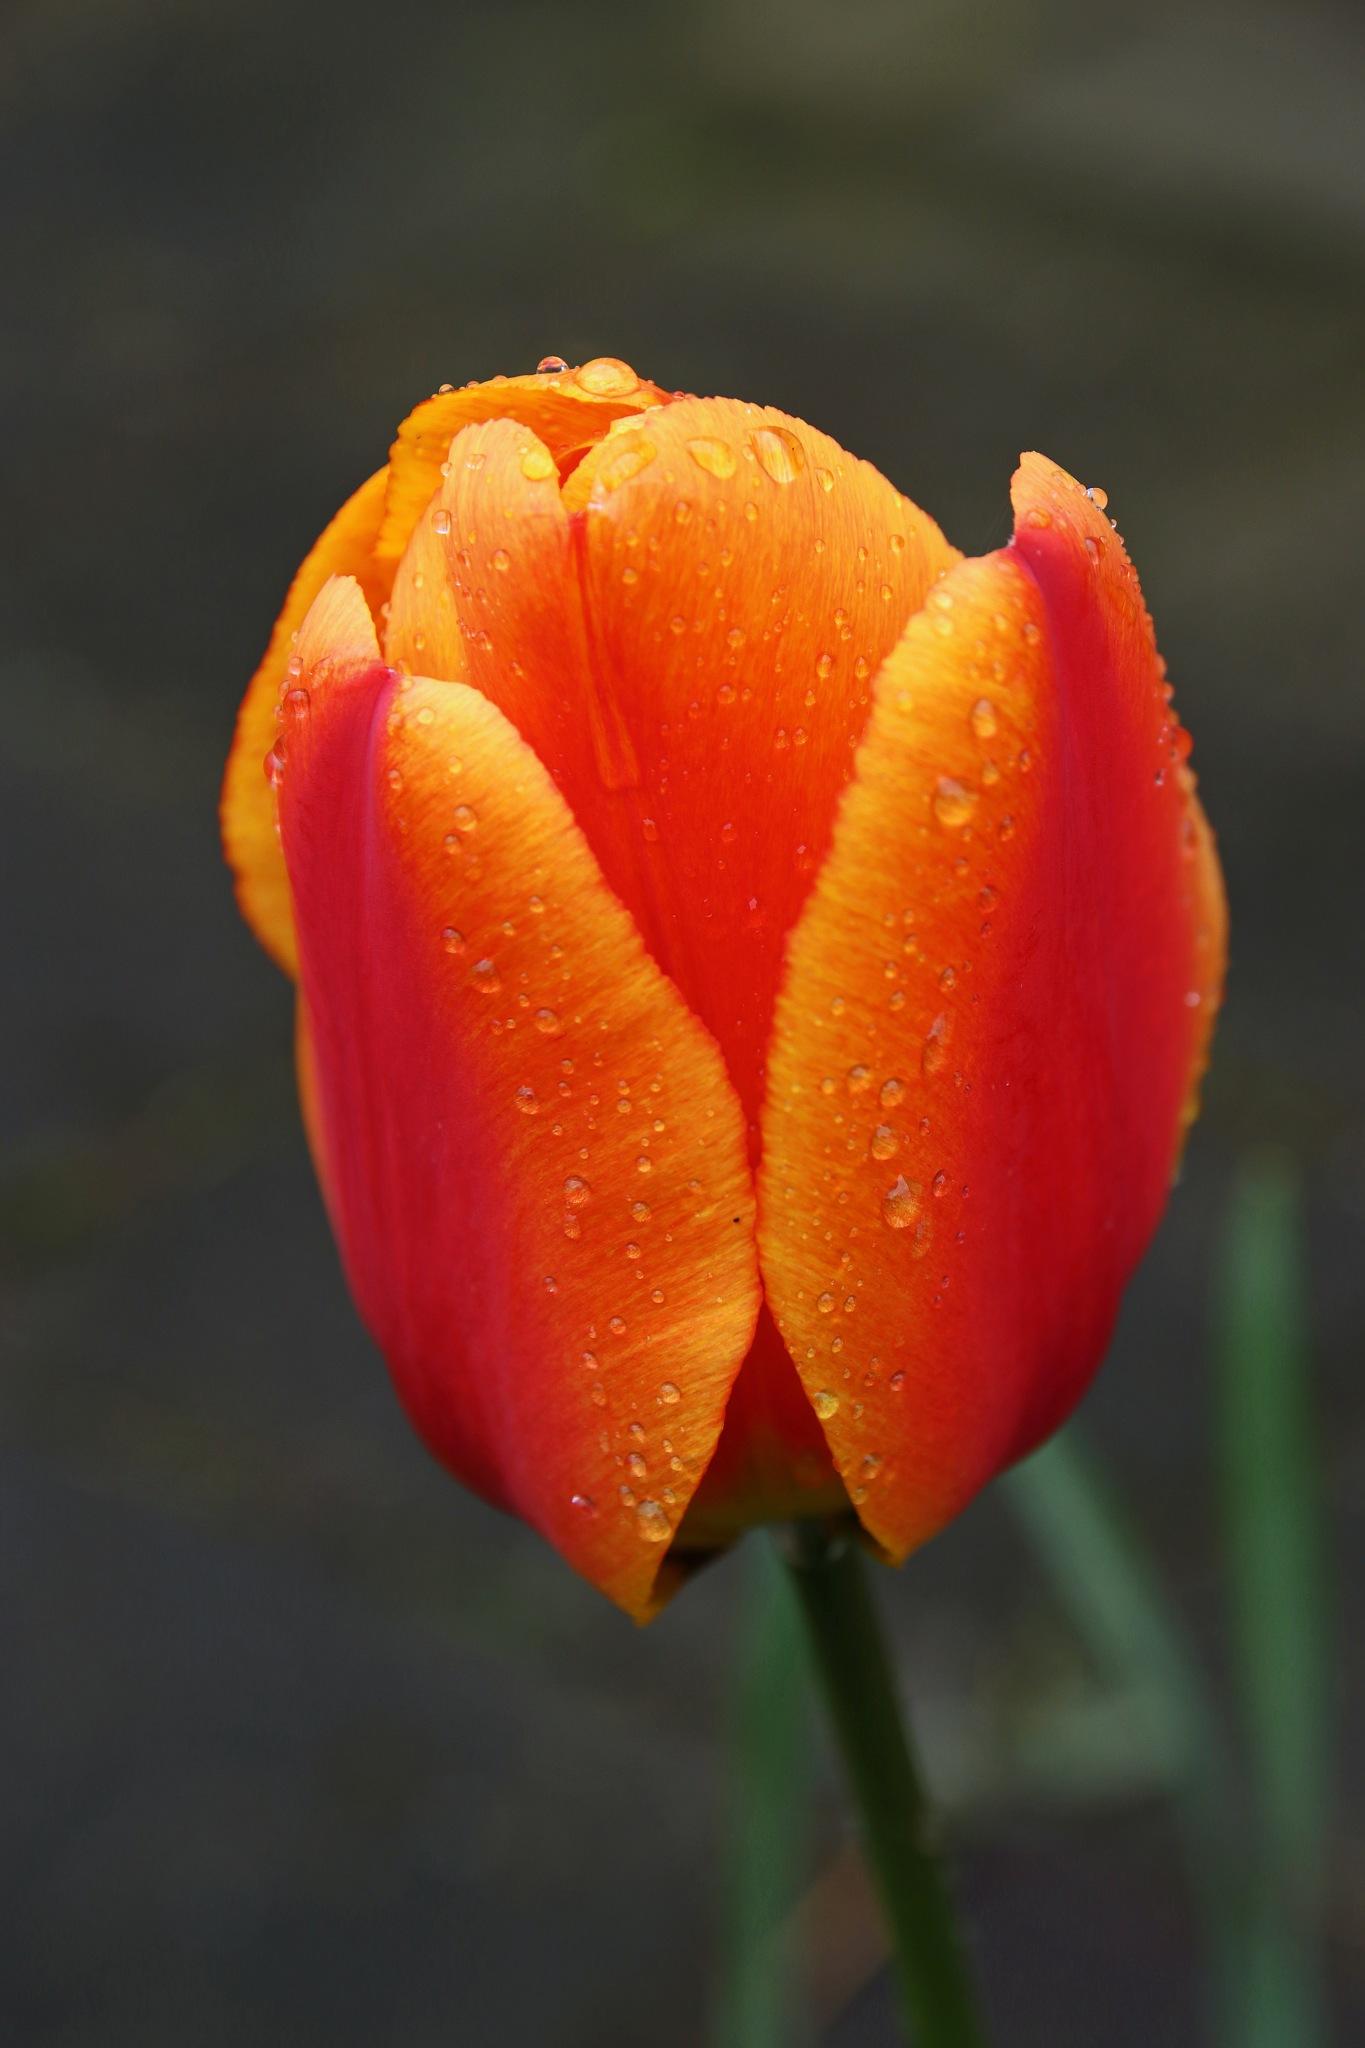 Rainy flower by Jeroen Wouter van der Vlist